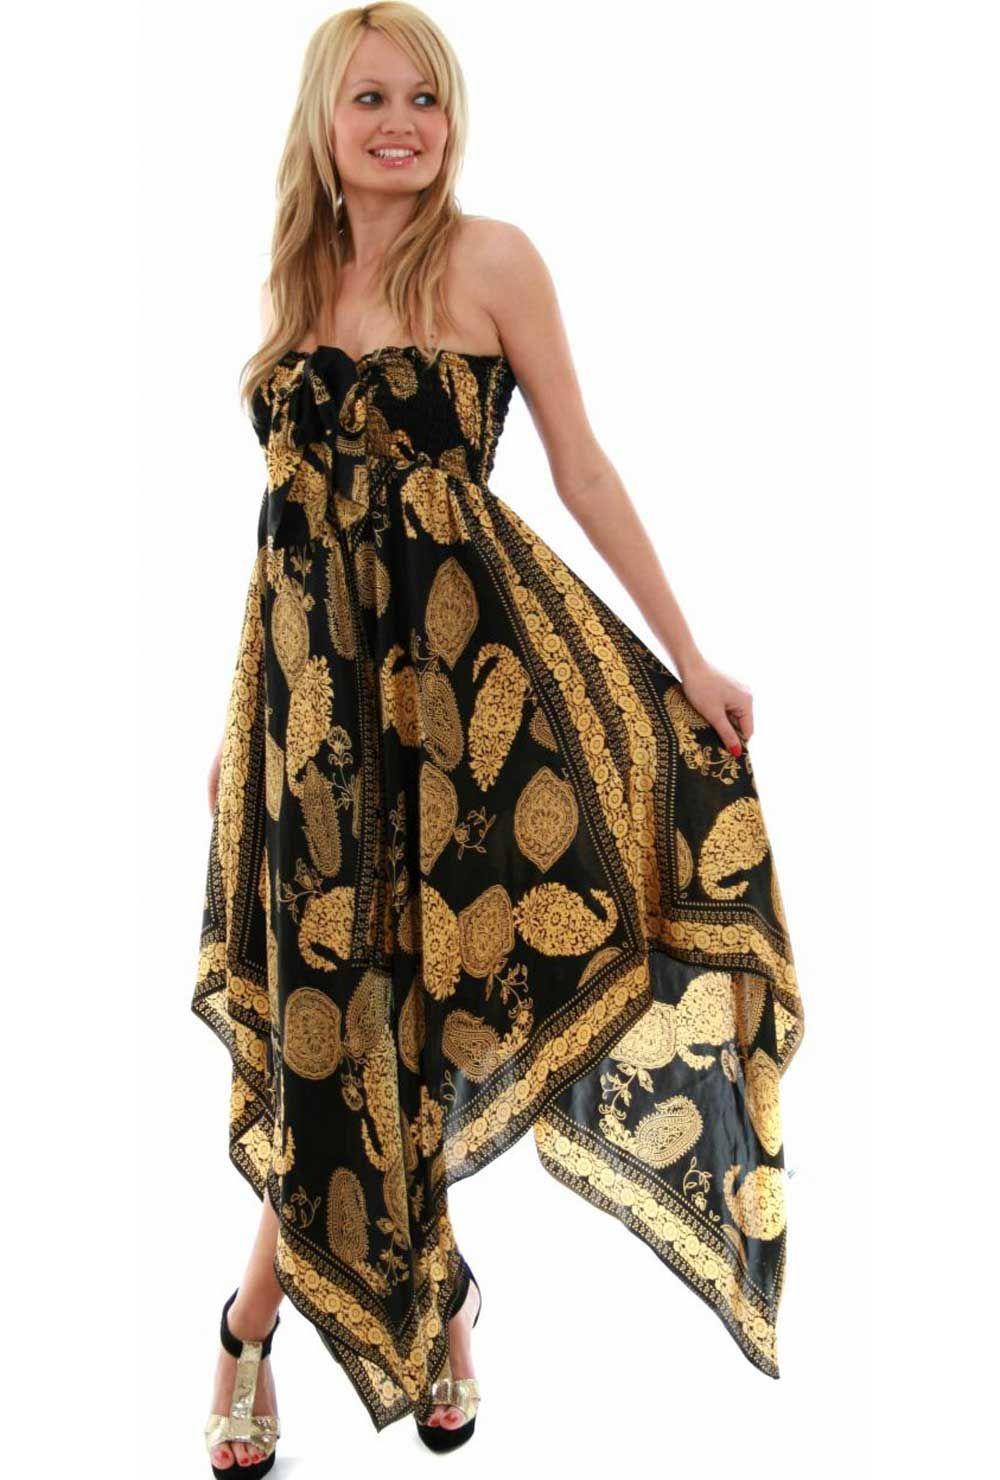 handkerchief dresses | dresses day dresses matalan paisley print ...